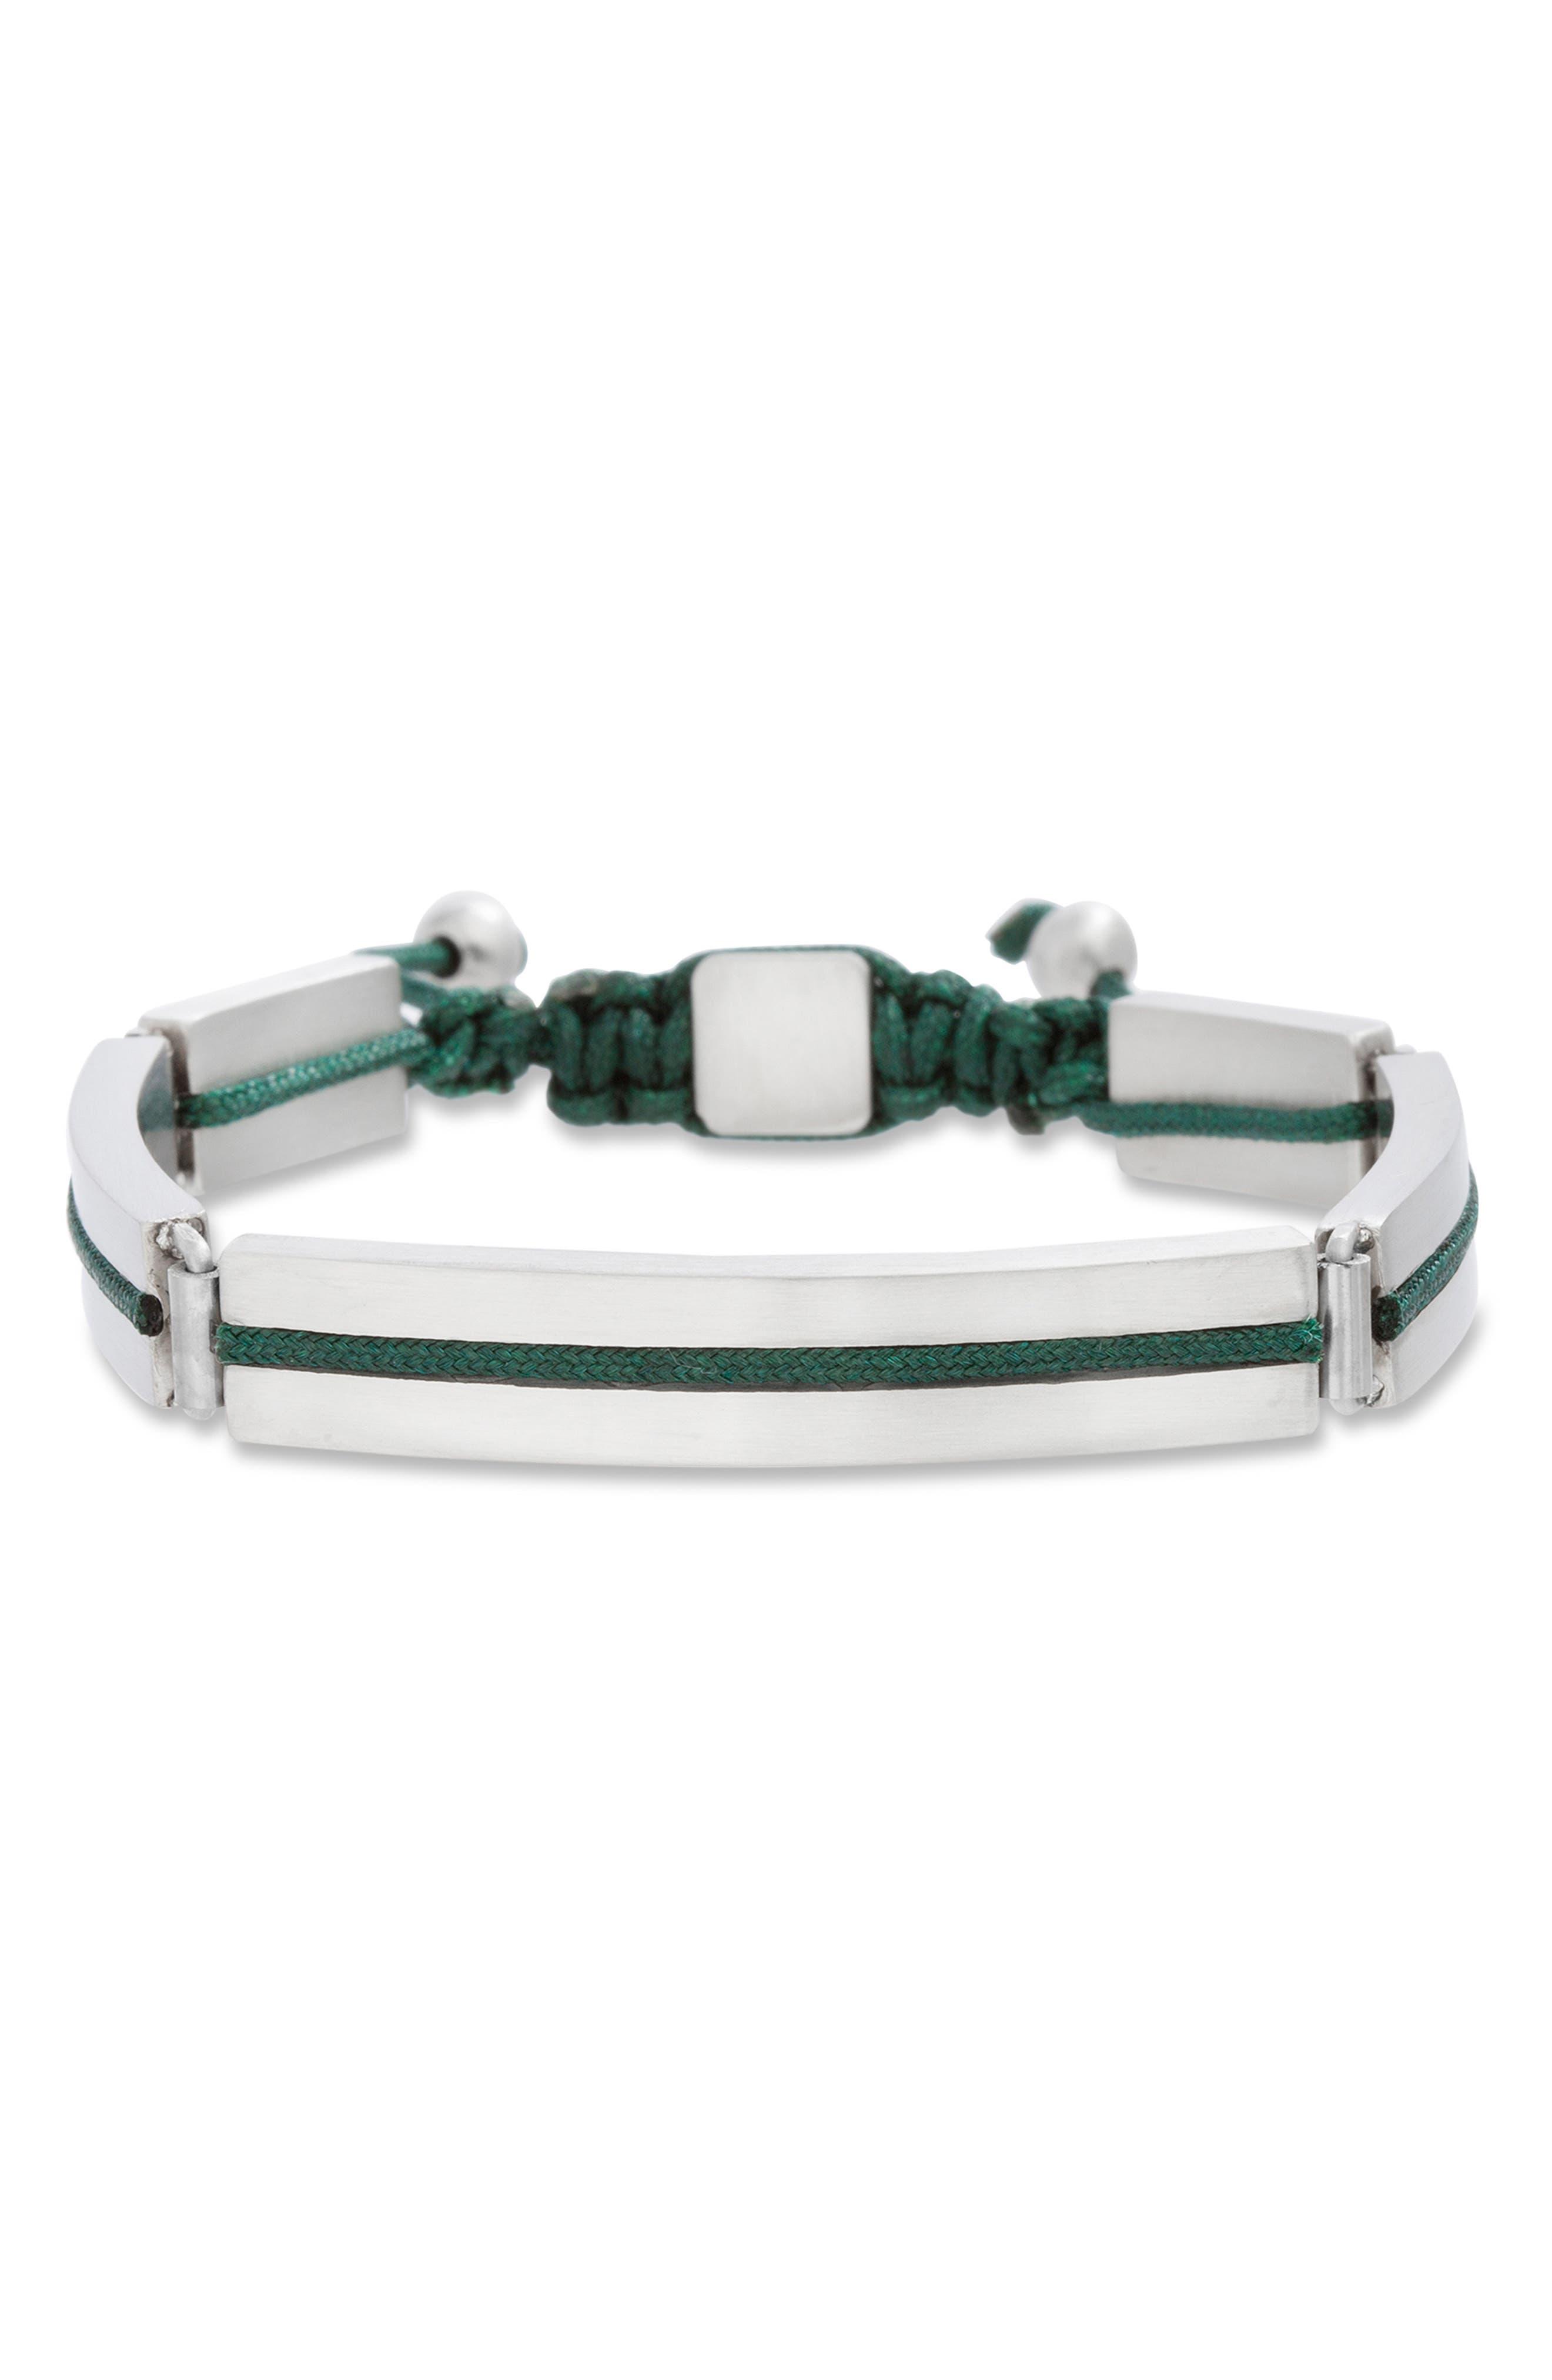 BEN SHERMAN Adjustable Steel Bracelet in Black